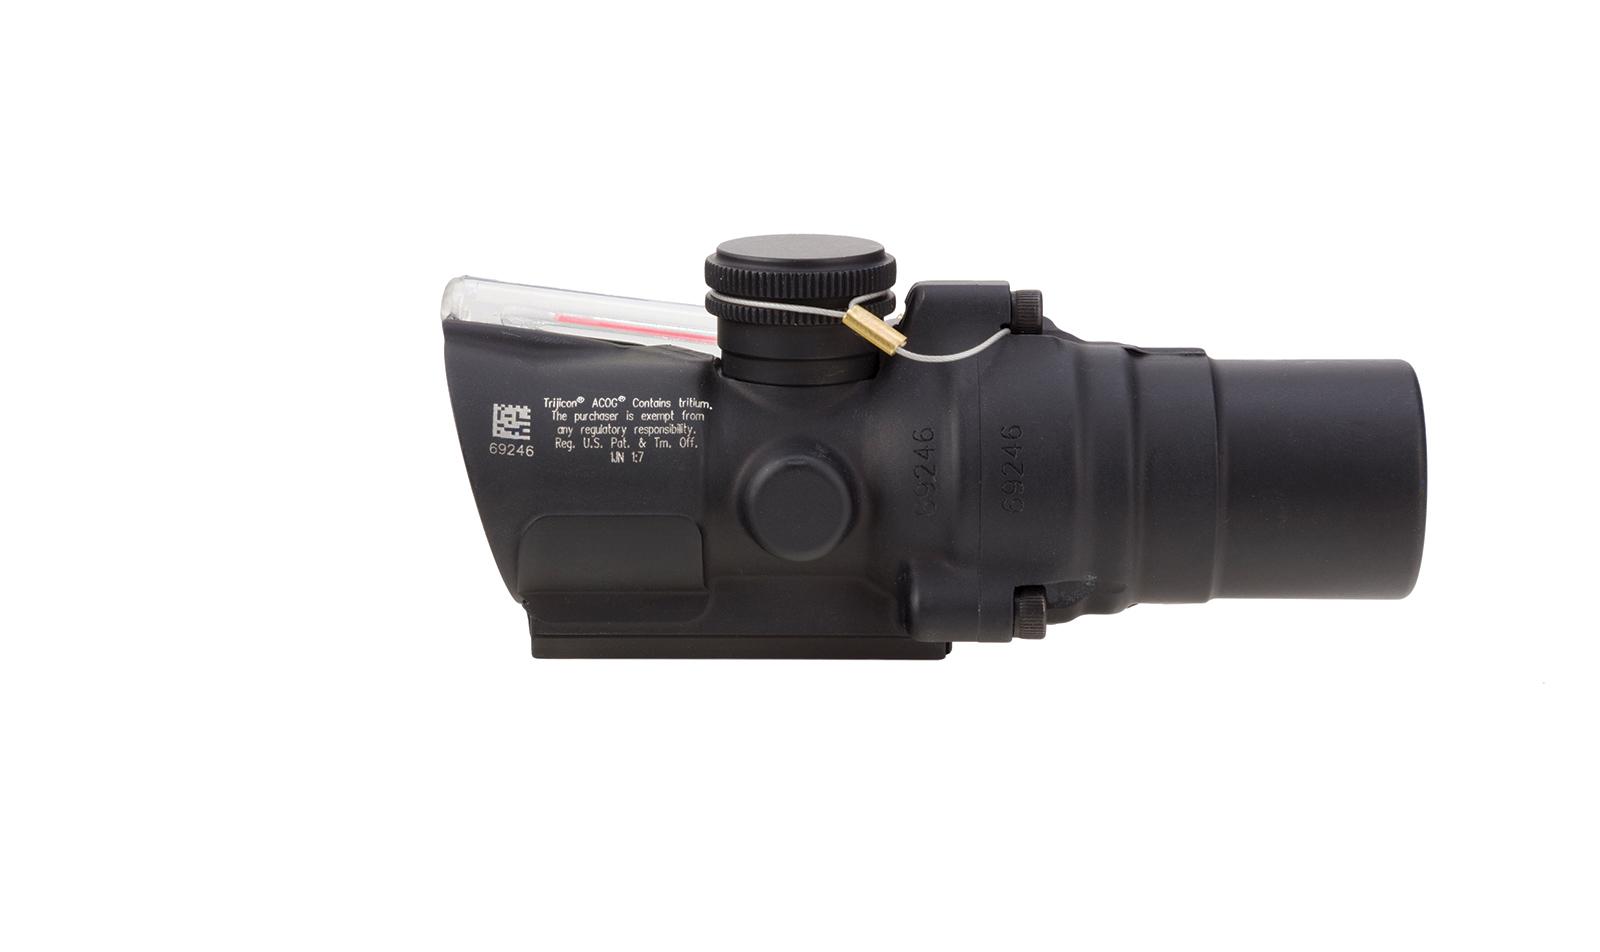 TA44-C-400241 angle 2